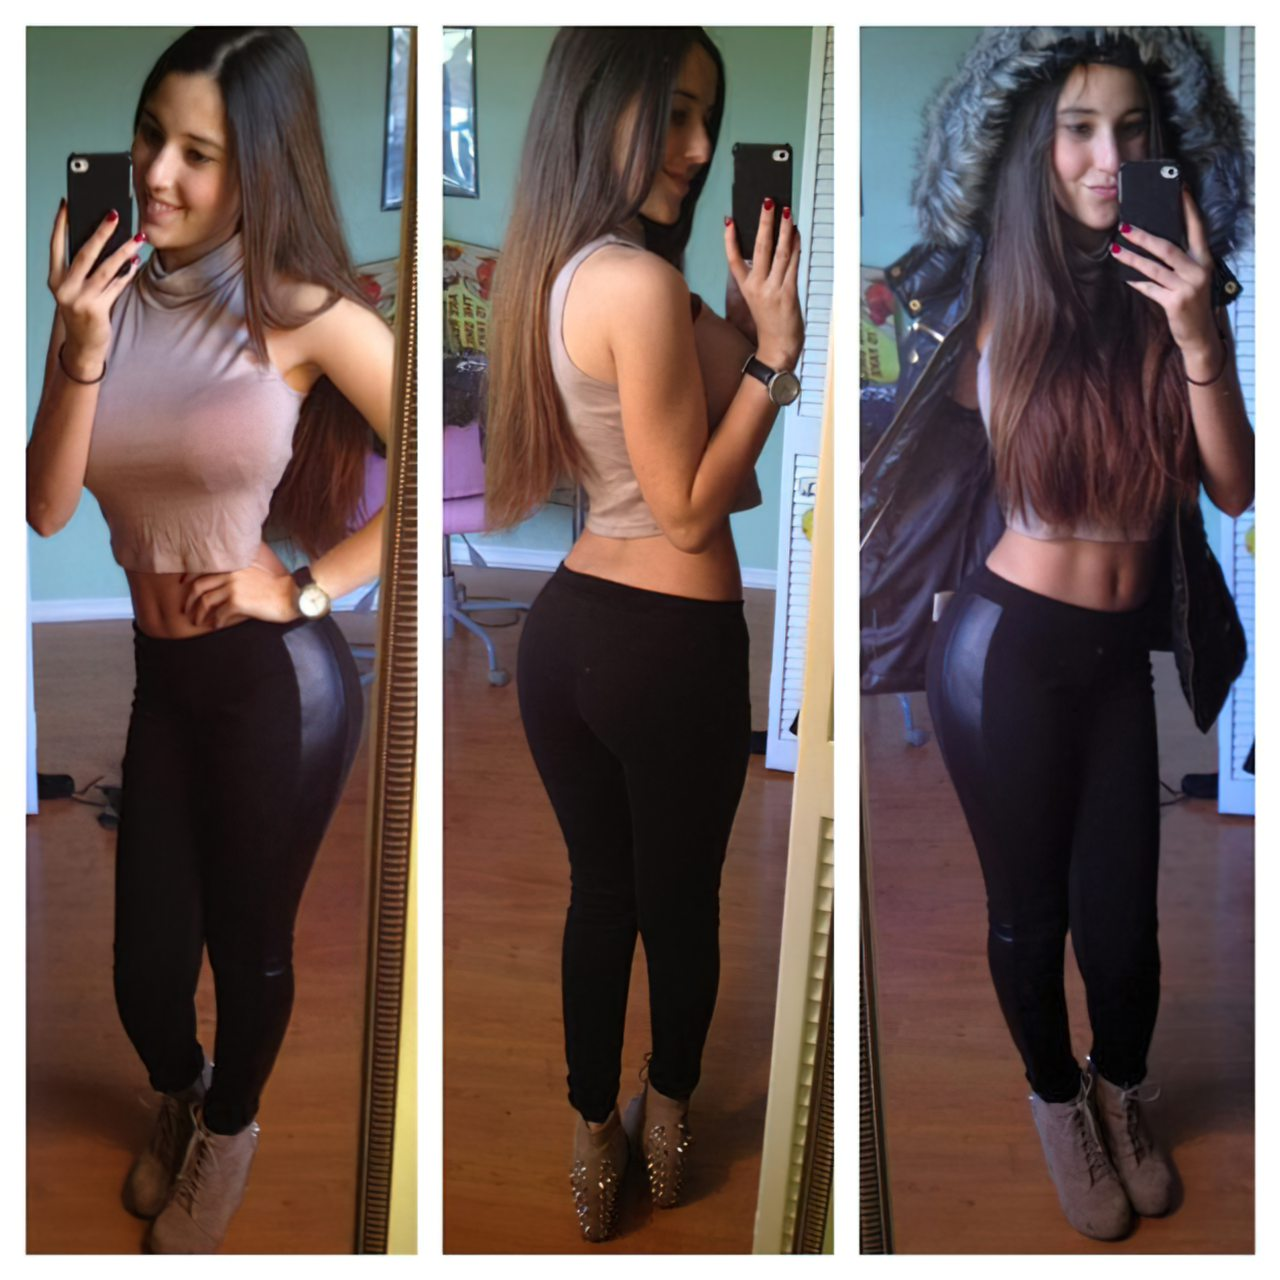 Angie Verona (21)